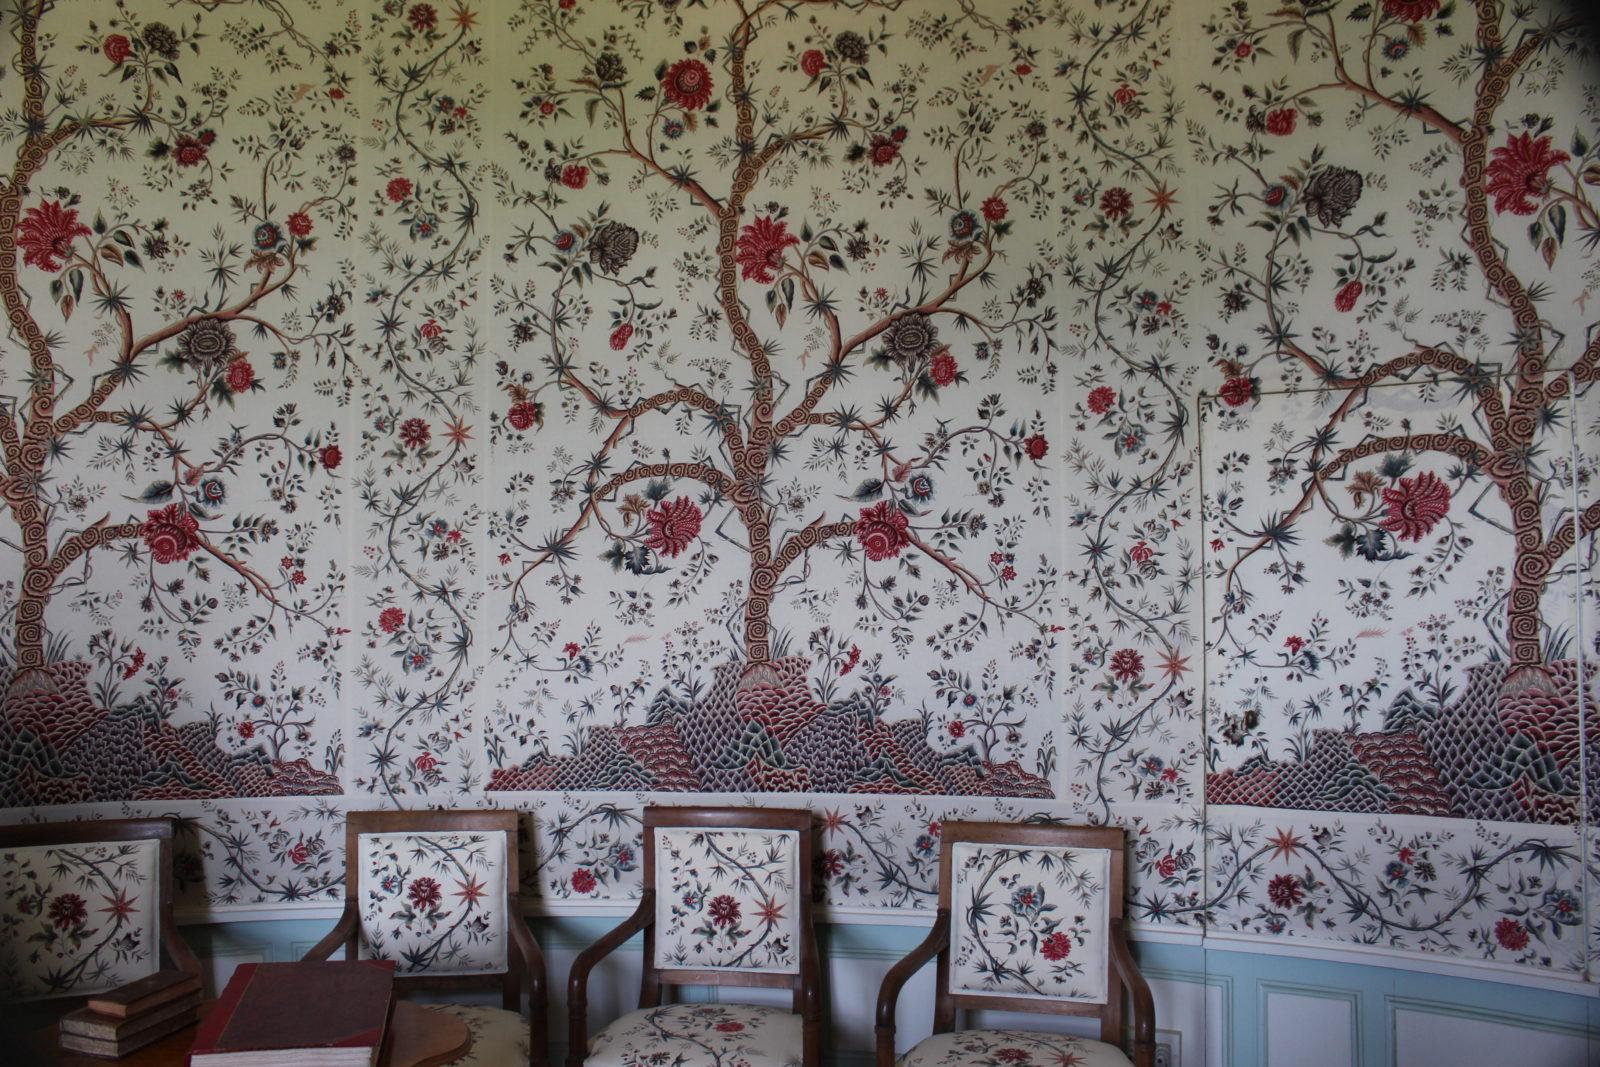 Bussy-Rabutin salon - tissu et papier peint assortis